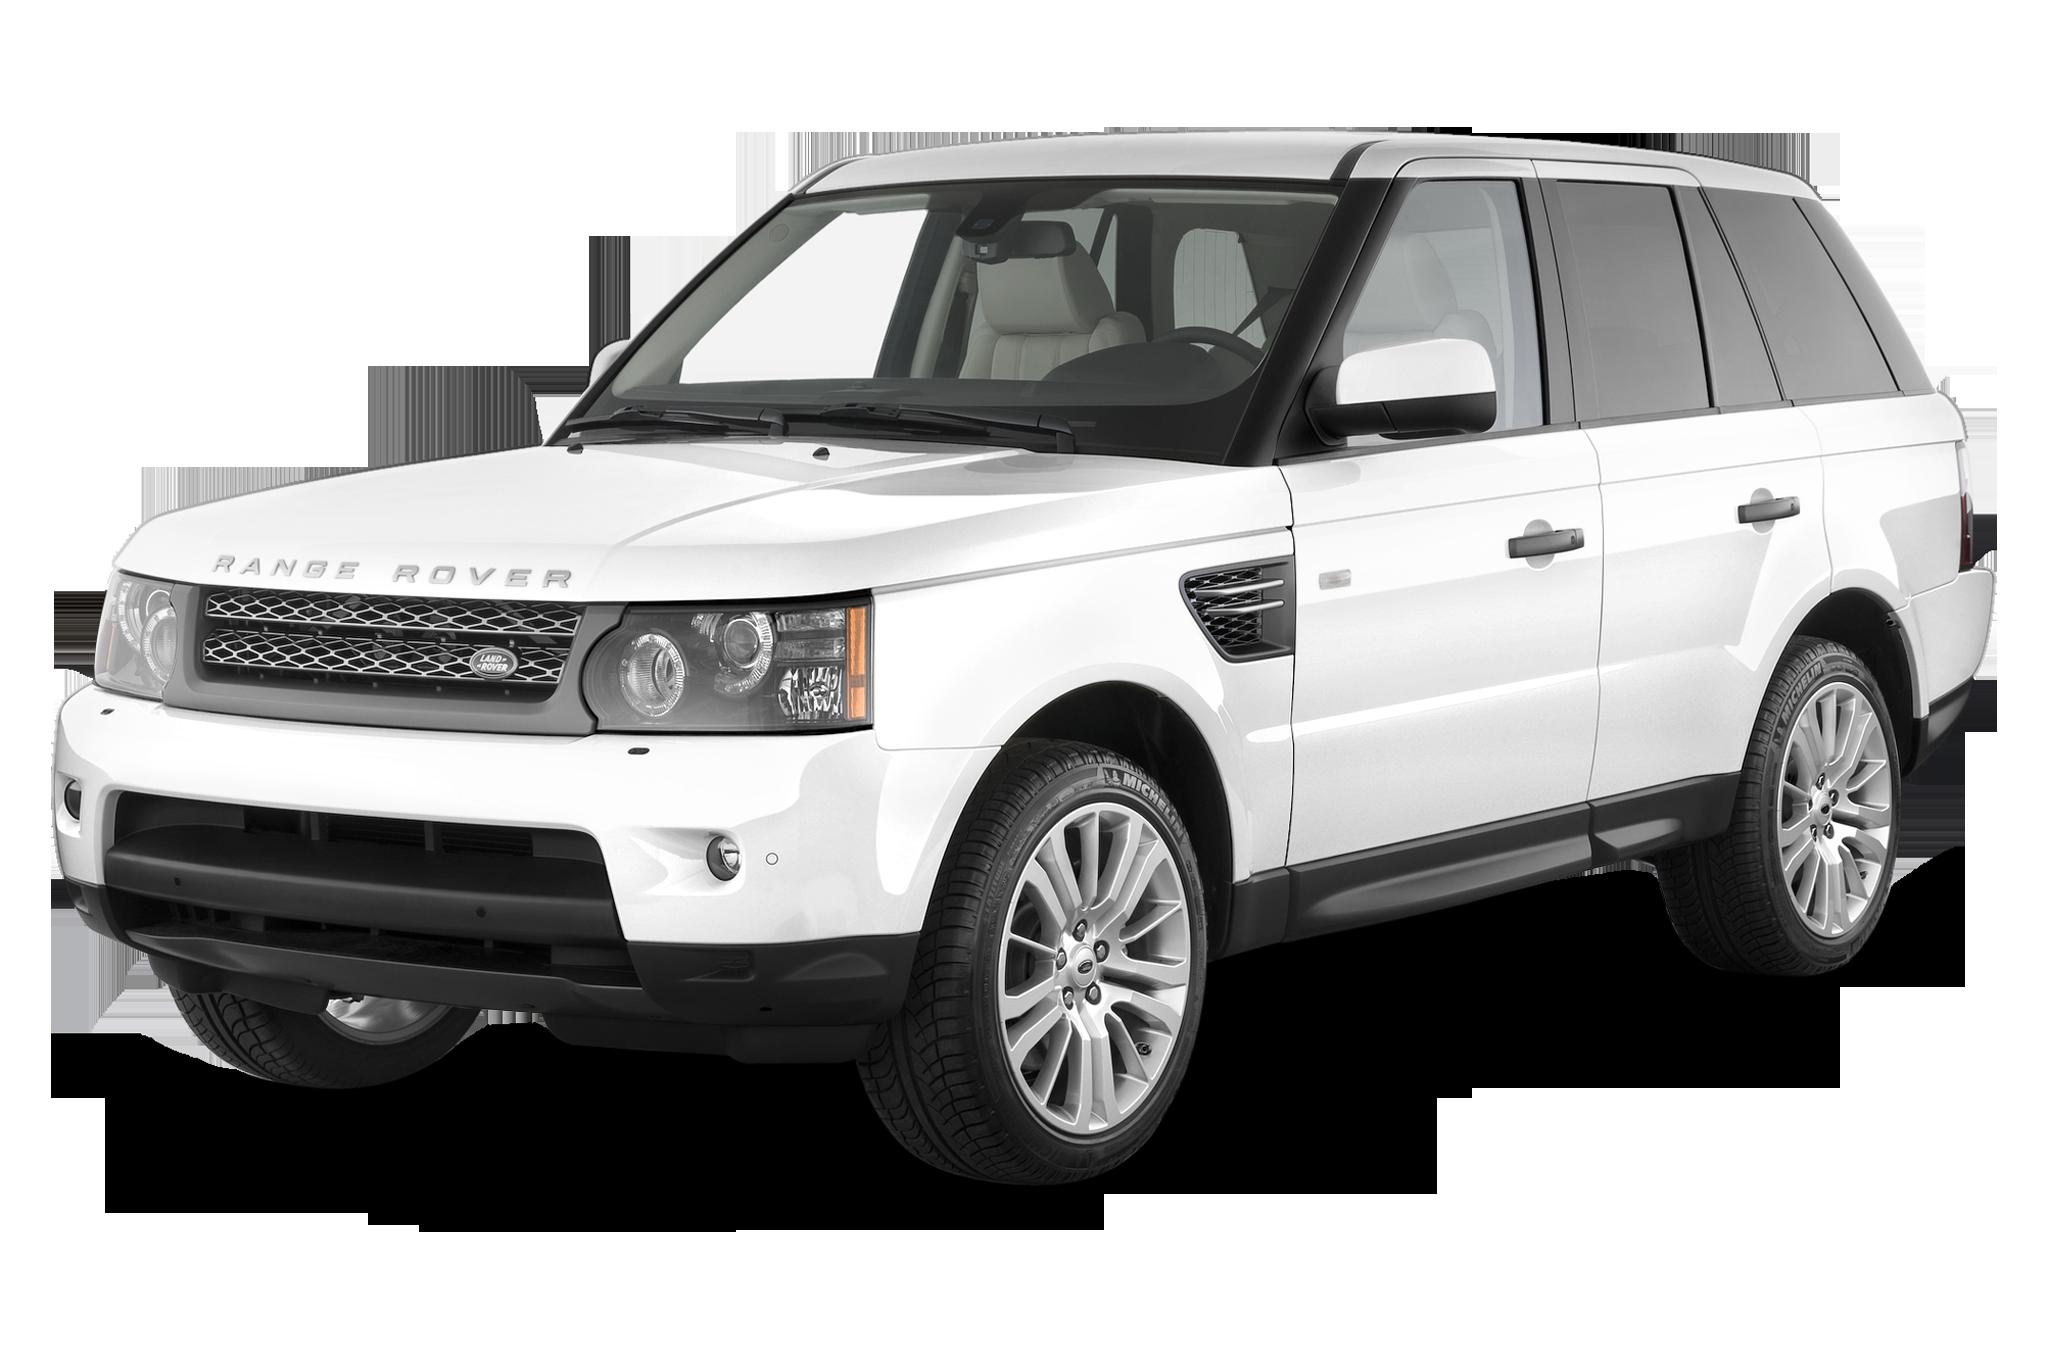 https://st.automobilemag.com/uploads/sites/10/2015/11/2011-land-rover-range-rover-sport-hse-suv-angular-front.png